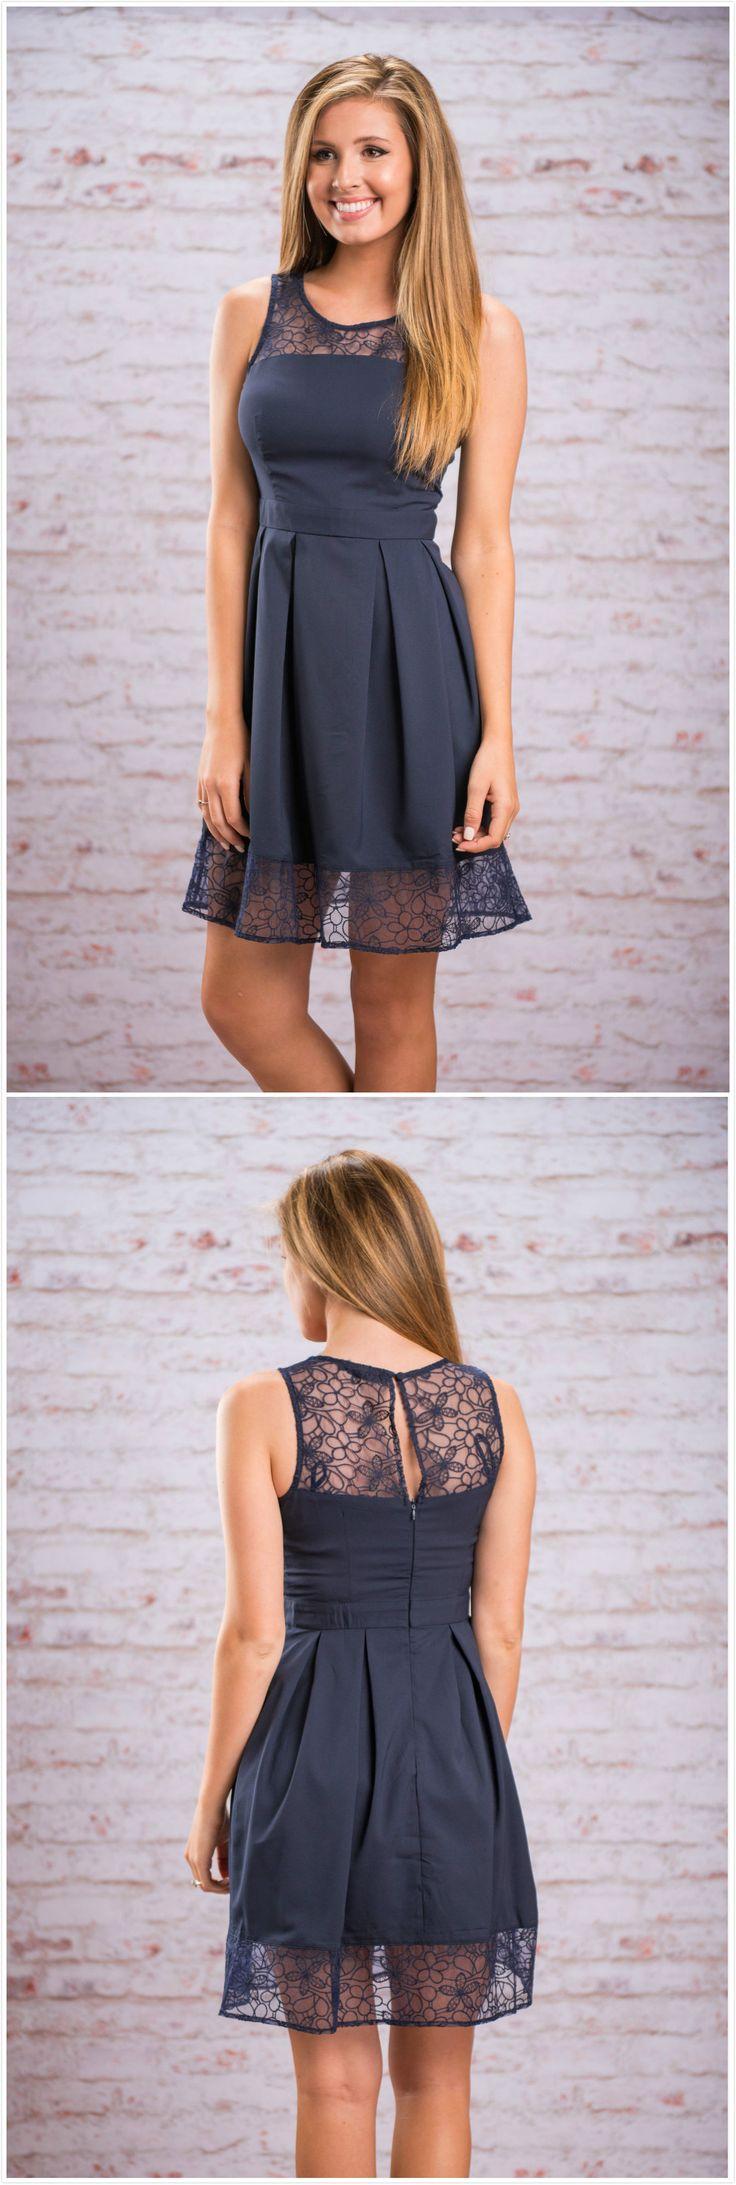 Round Neck Sleeveless Lace Splicing Midi Dresses